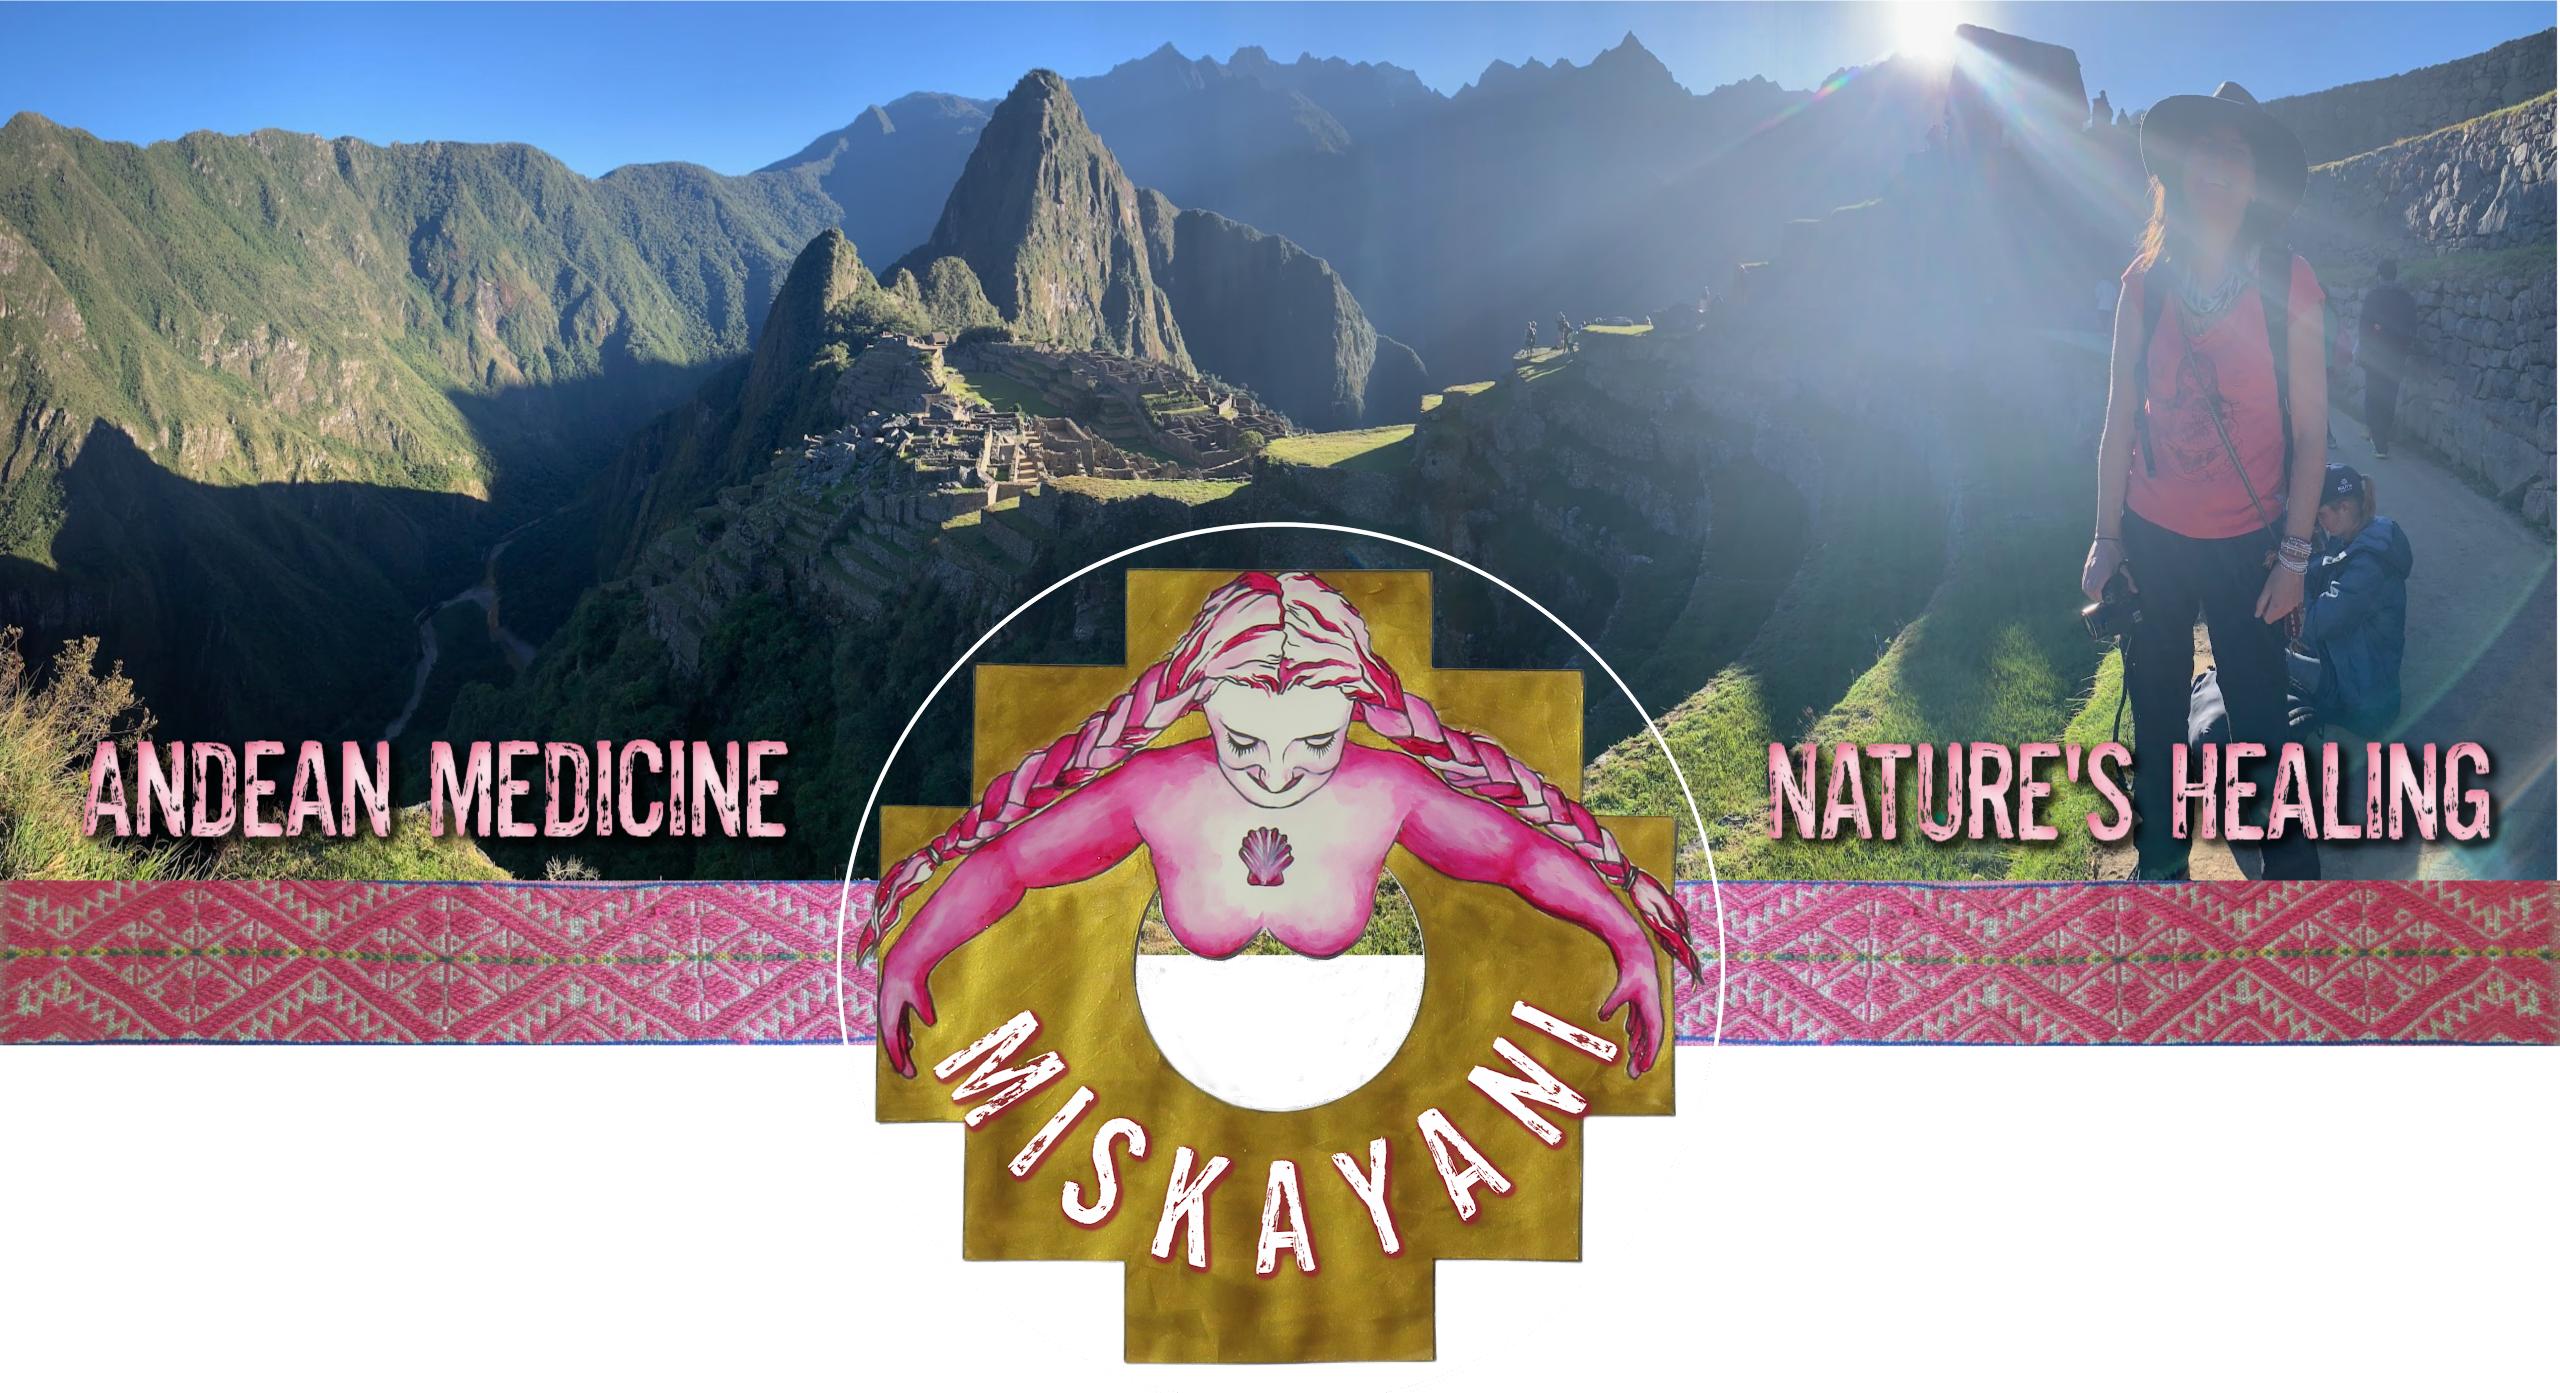 Miskayani logo ©K.Weinman